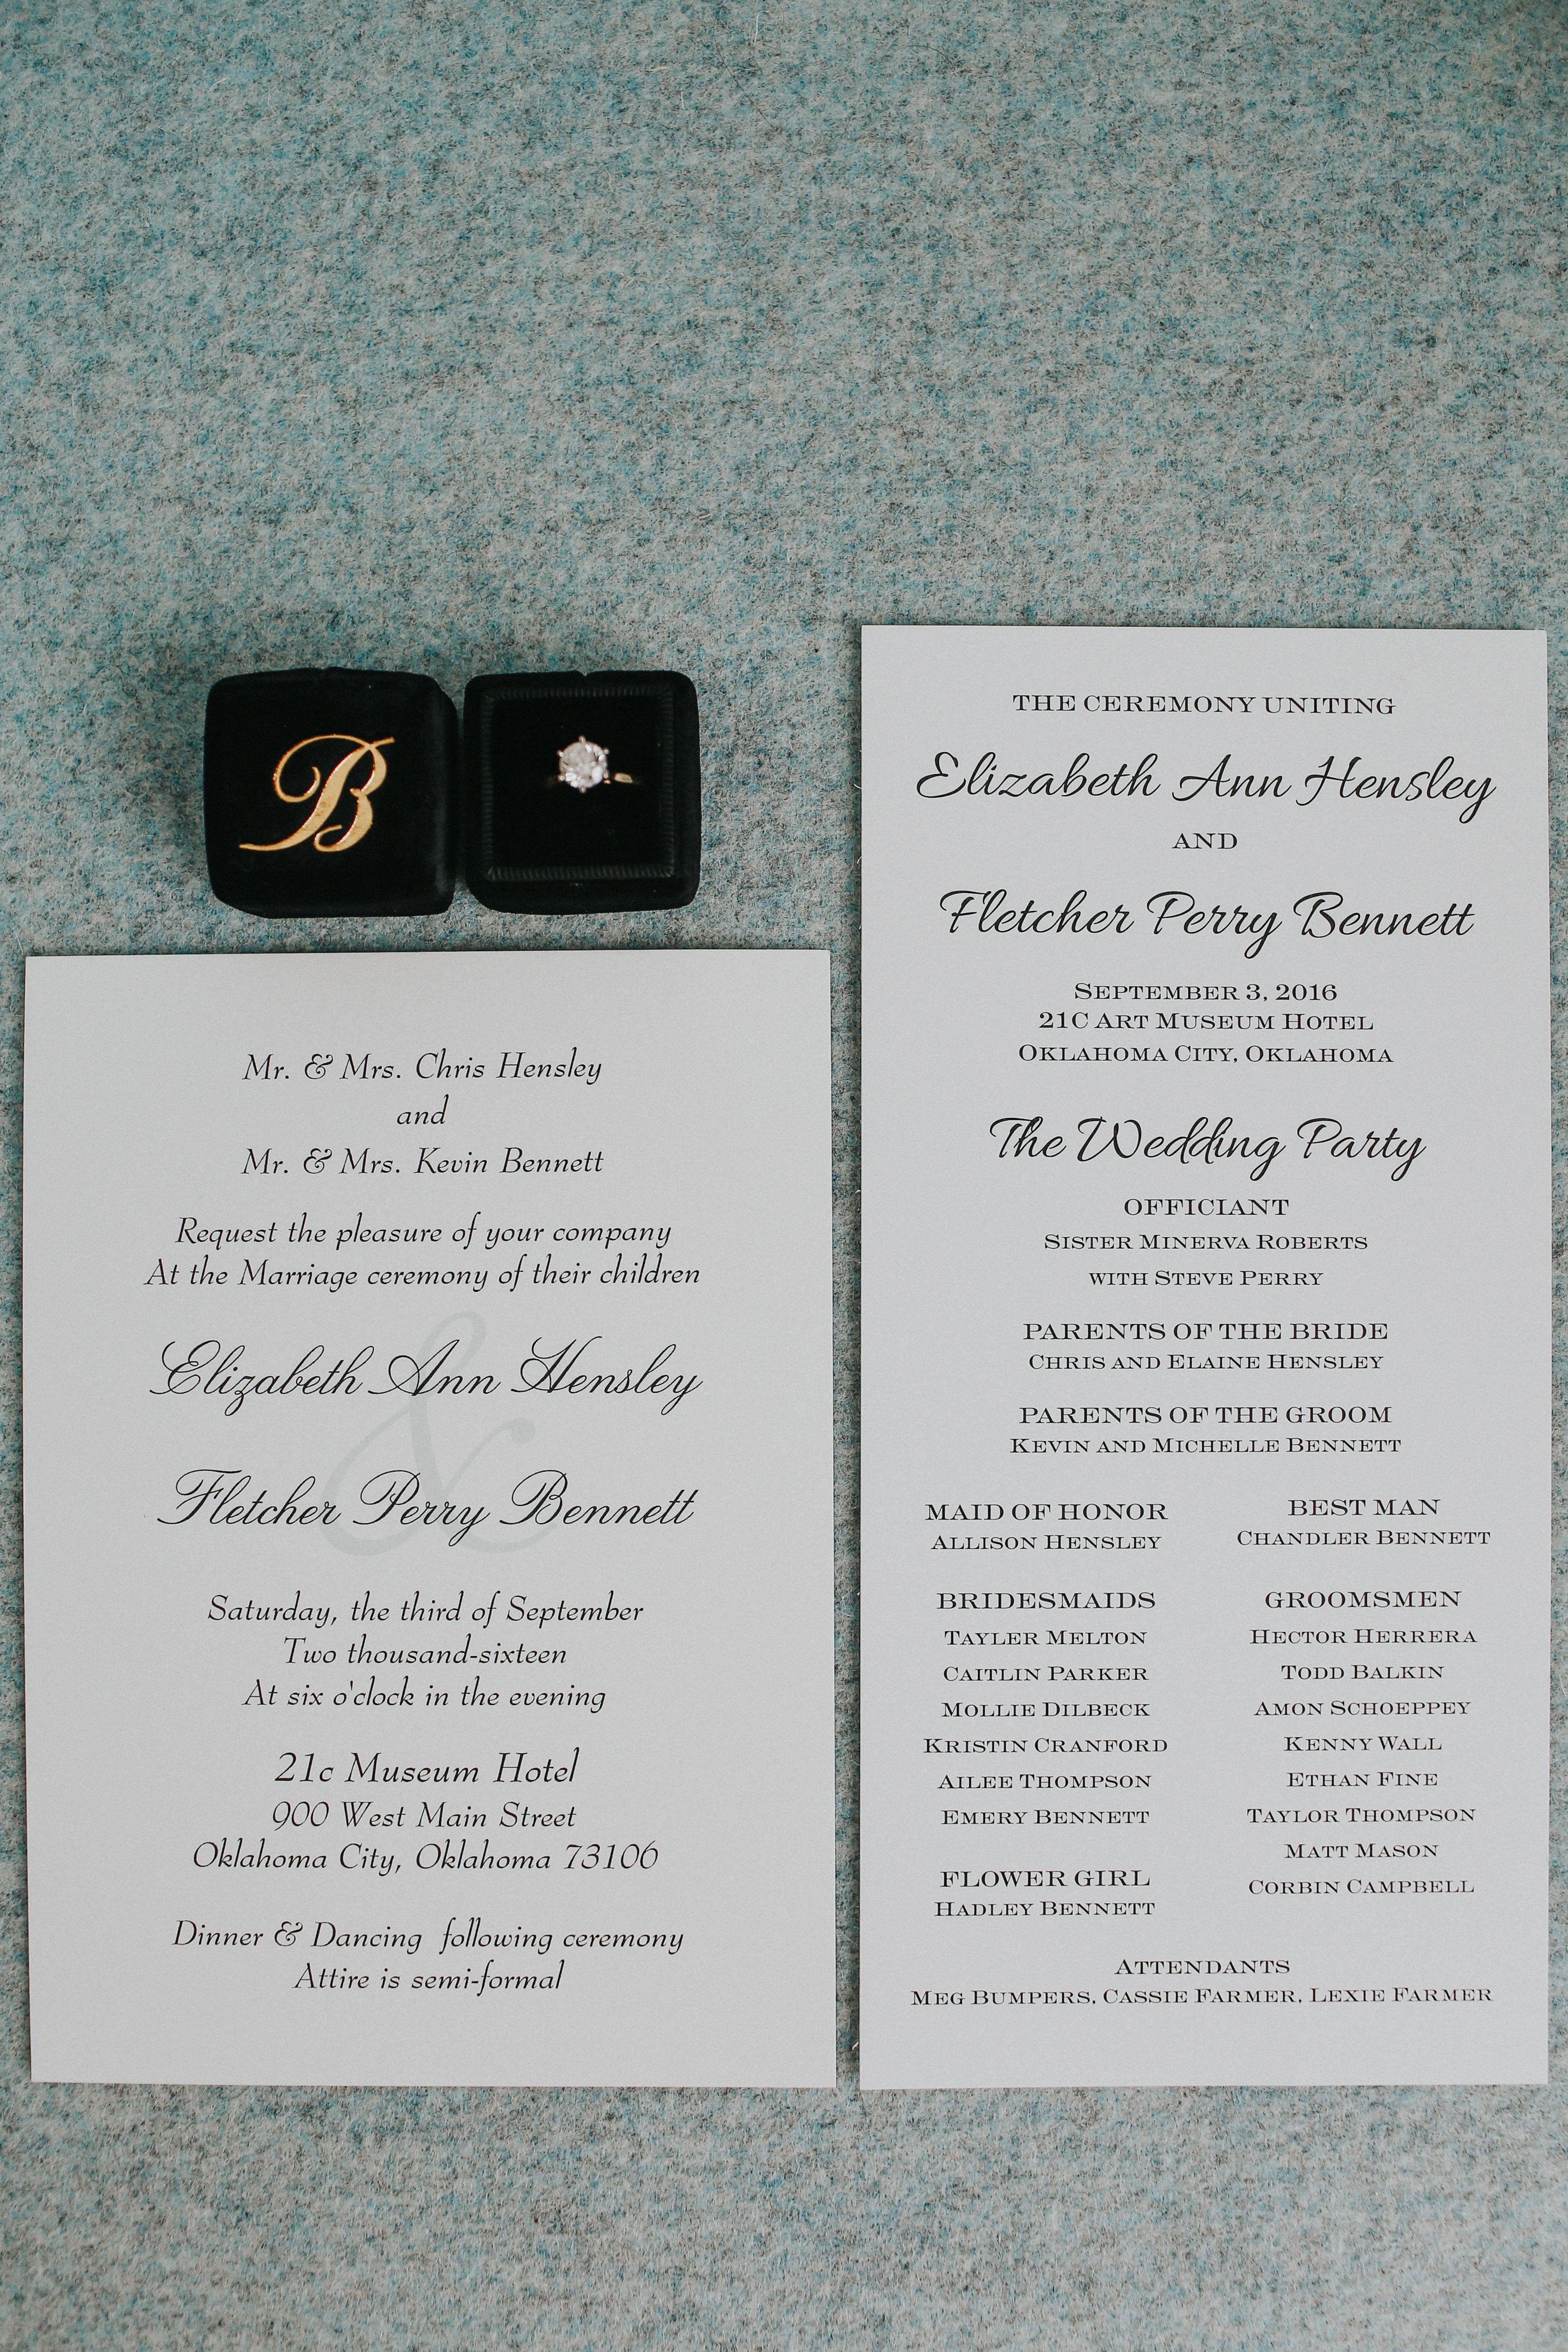 Wedding Invitations   21c Weddings   21c Oklahoma City   21c ...